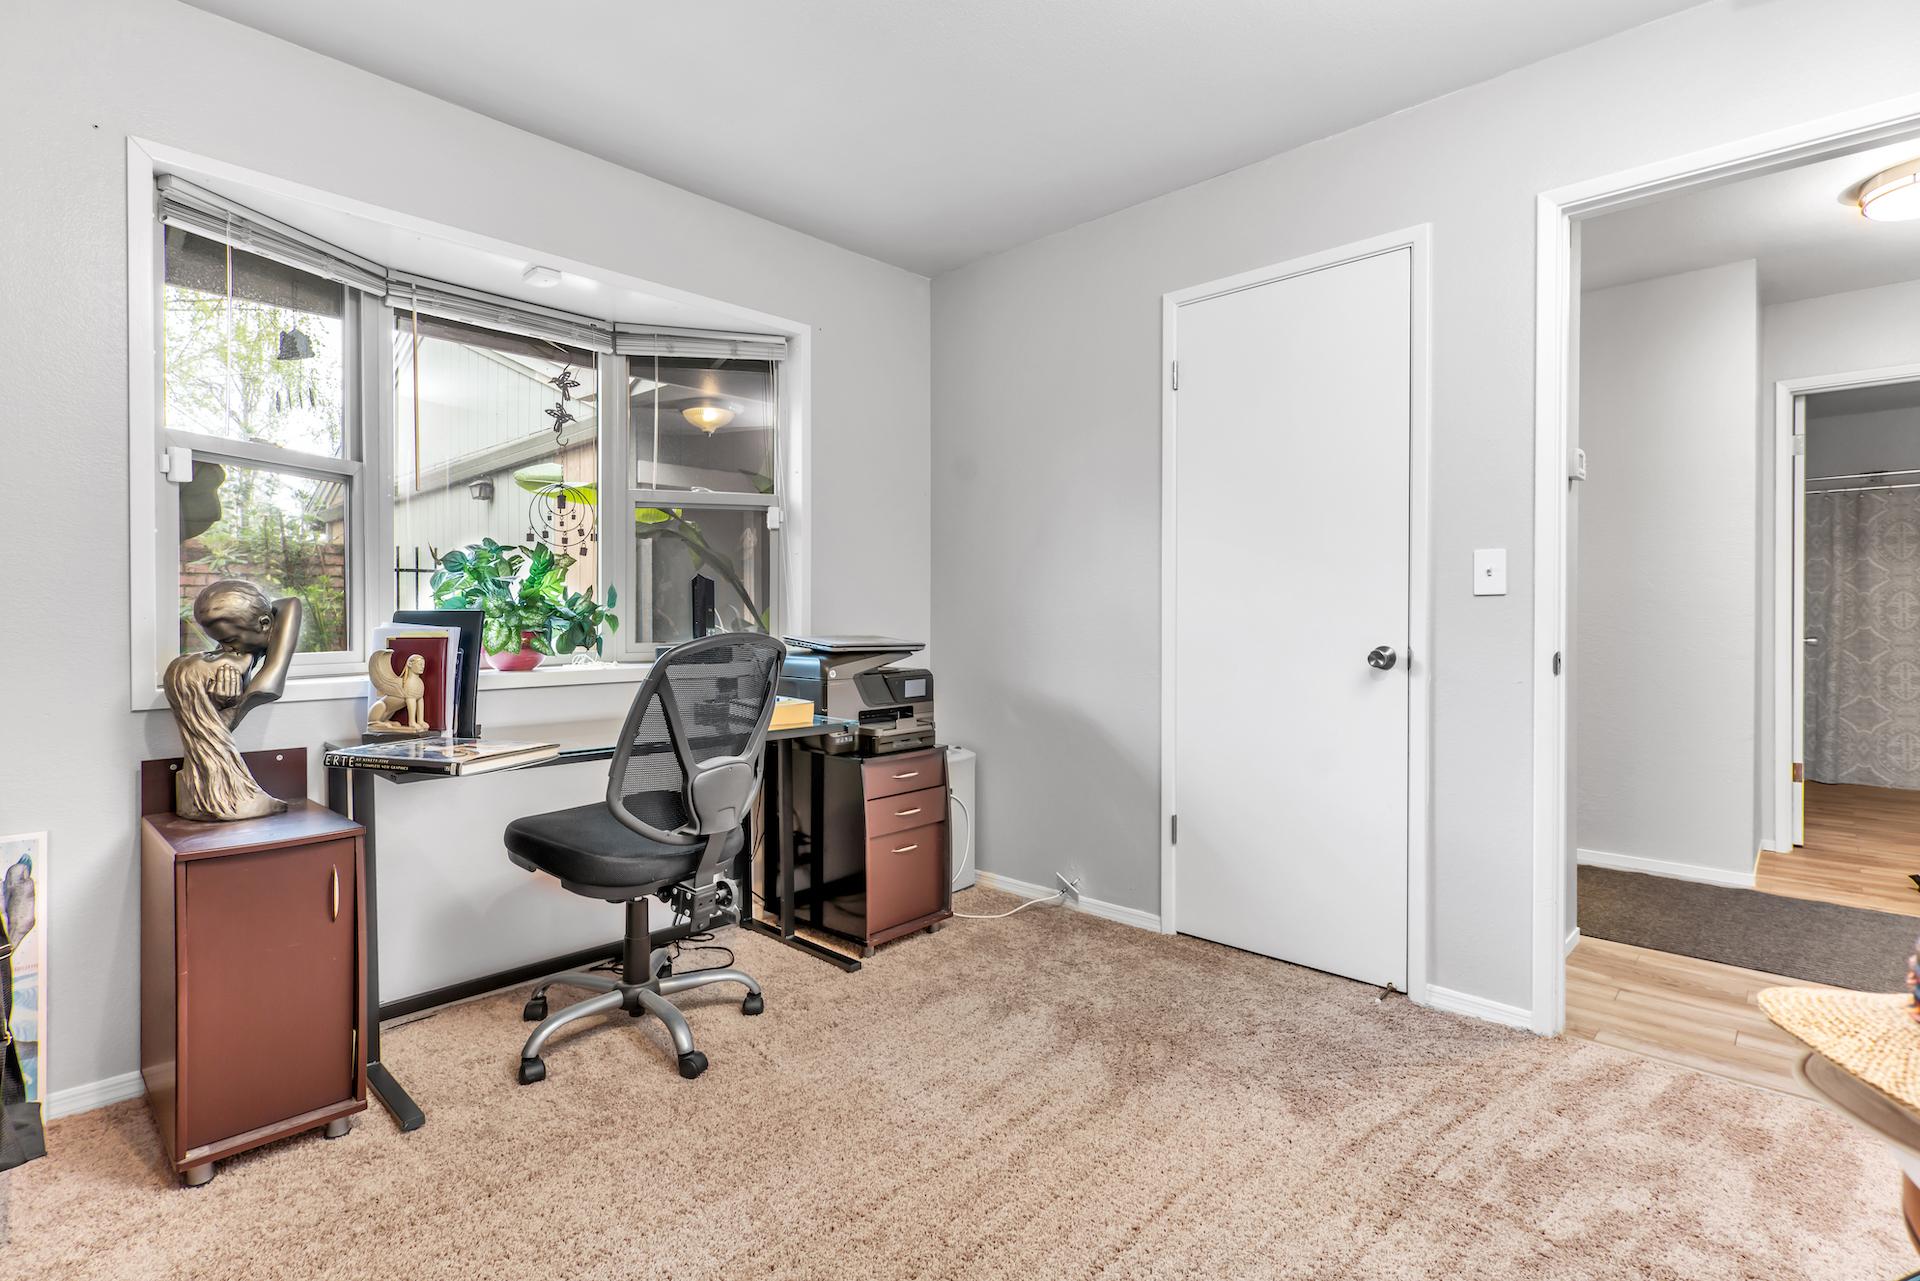 7033 La Costa Ln, Citrus Heights, Ca | Second Bedroom | Citrus Heights Real Estate Agent